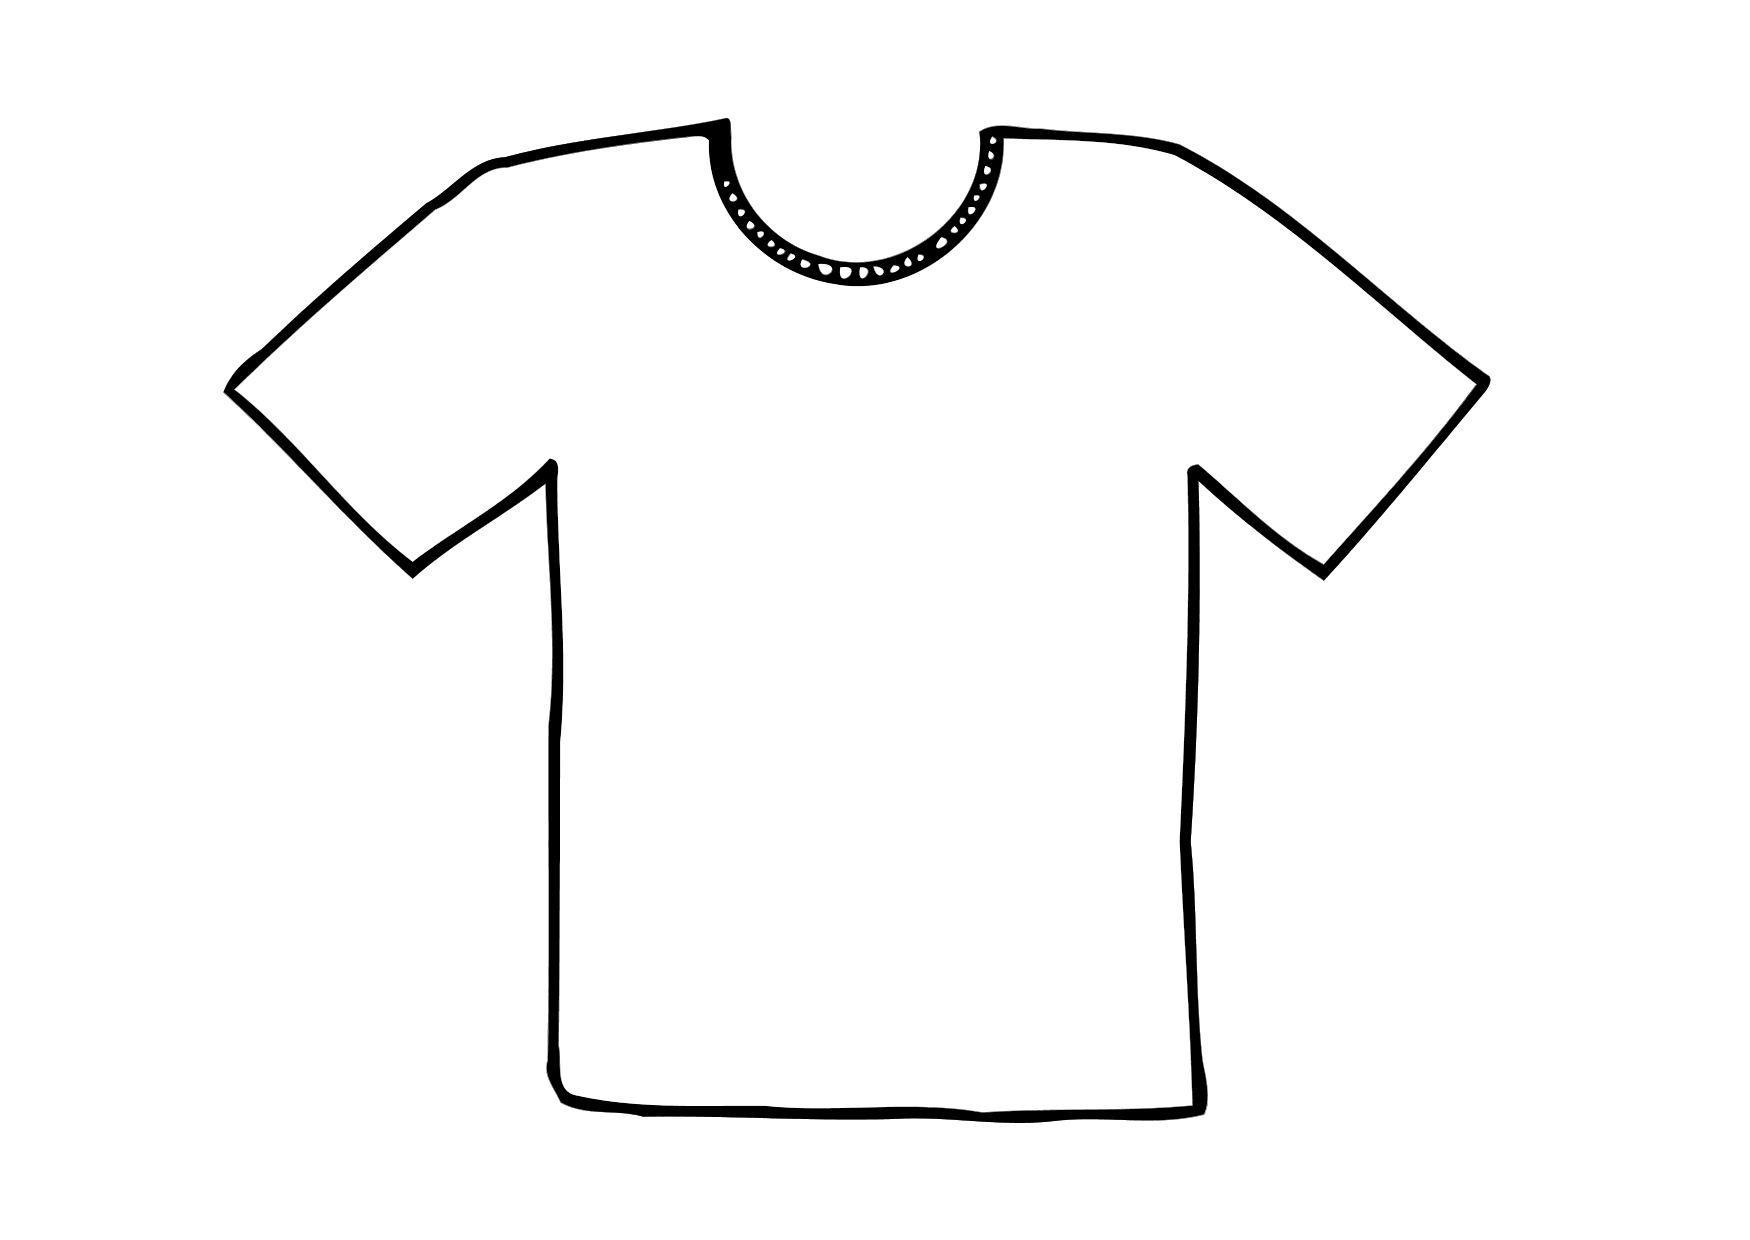 kleurplaat t shirt afb 12295